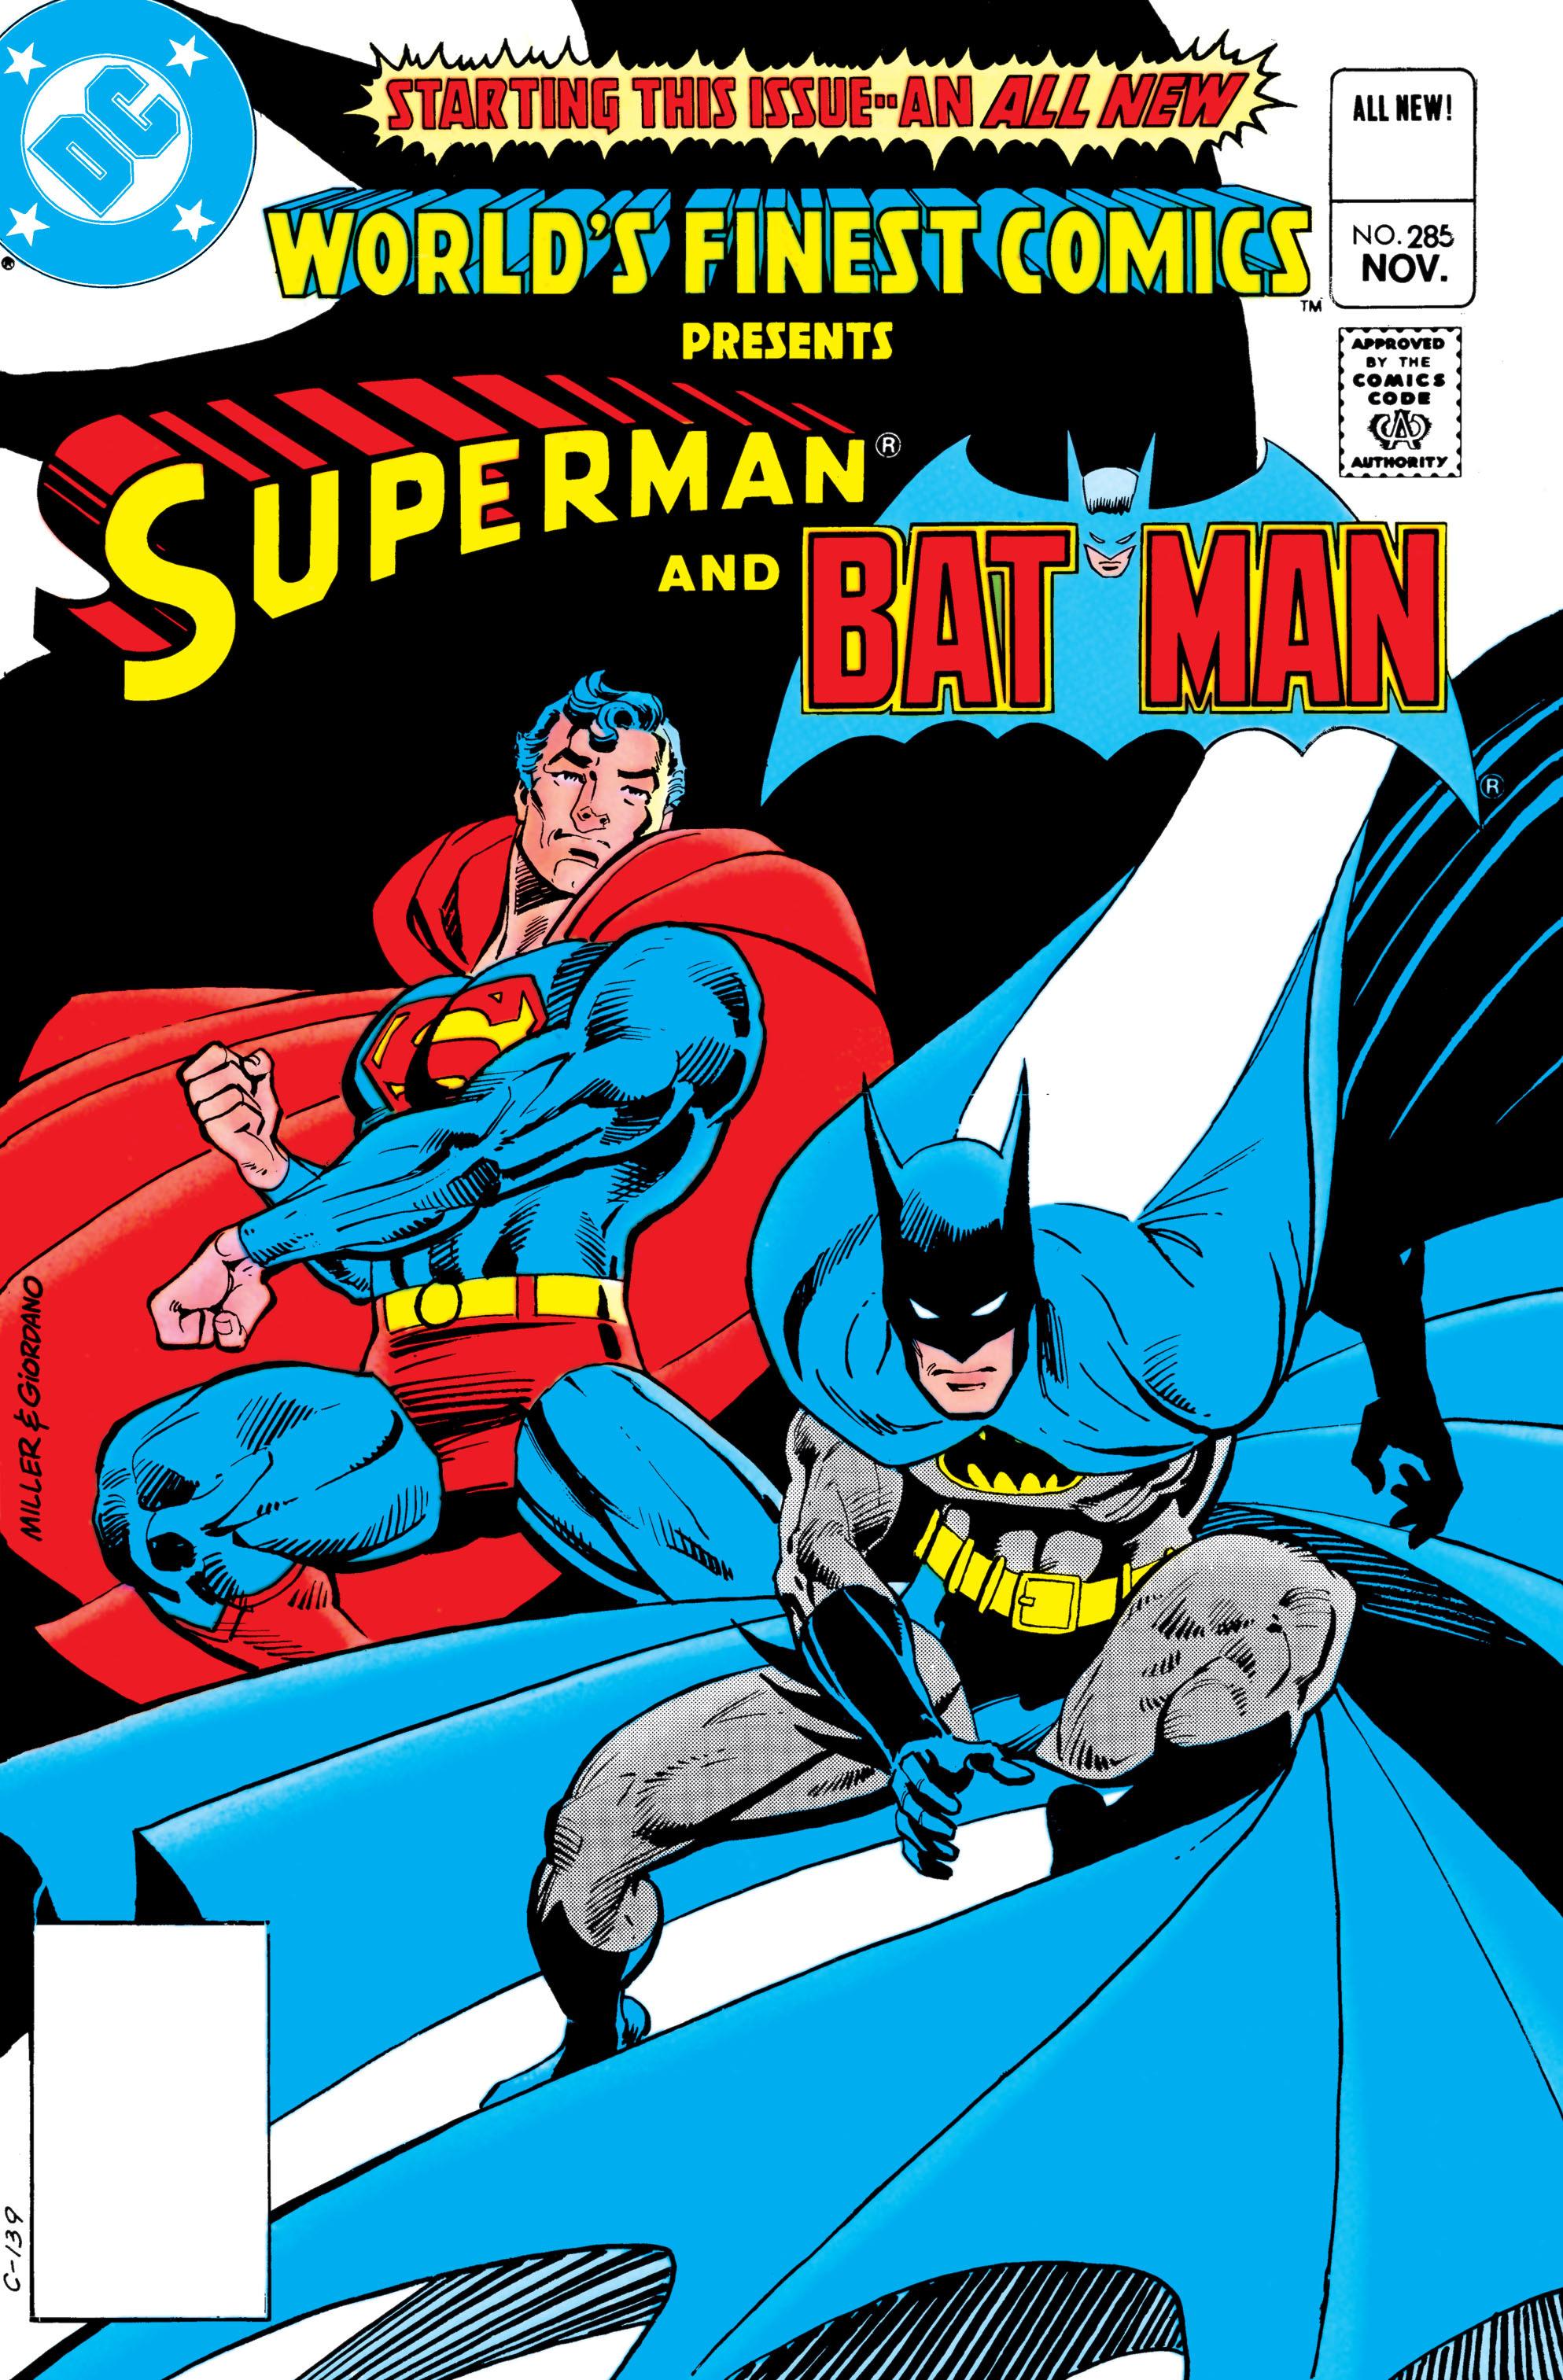 Read online World's Finest Comics comic -  Issue #285 - 1